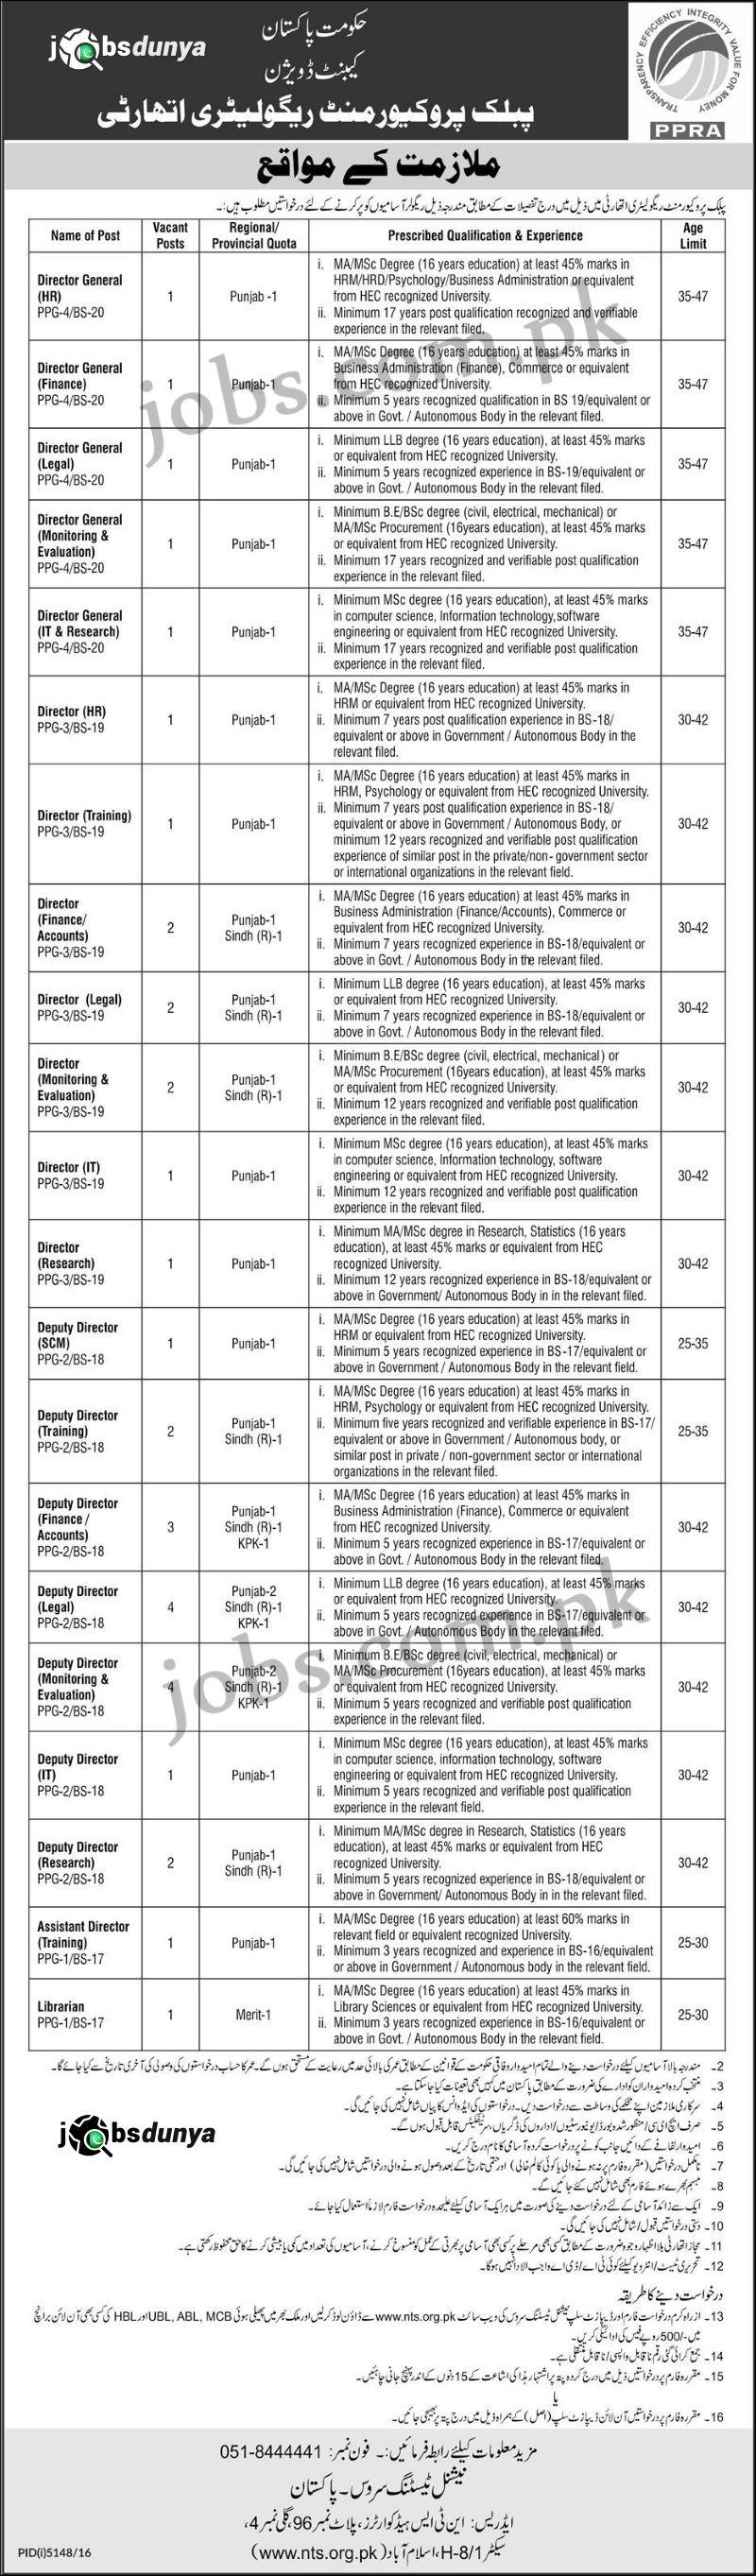 Public Procurement Regulatory Authority PPRA Jobs 2017 96 Posts – Procurement Director Jobs